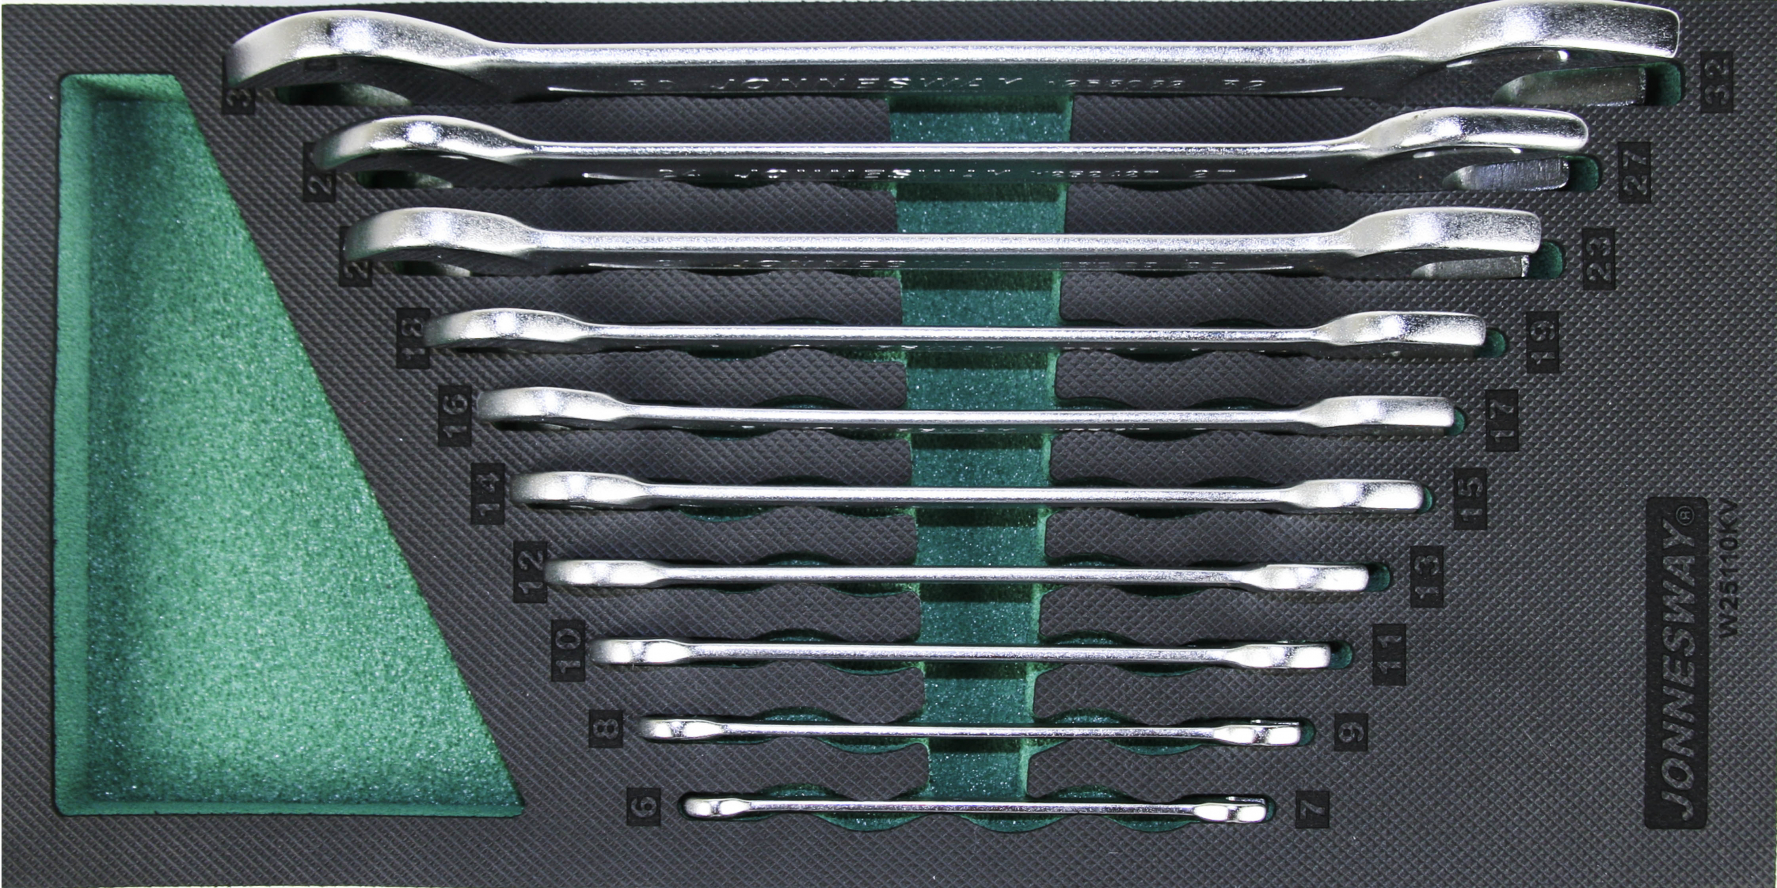 Modul pěnový - klíče ploché otevřené, 6x7 - 30x32 mm, sada 10 ks - JONNESWAY W25110KV